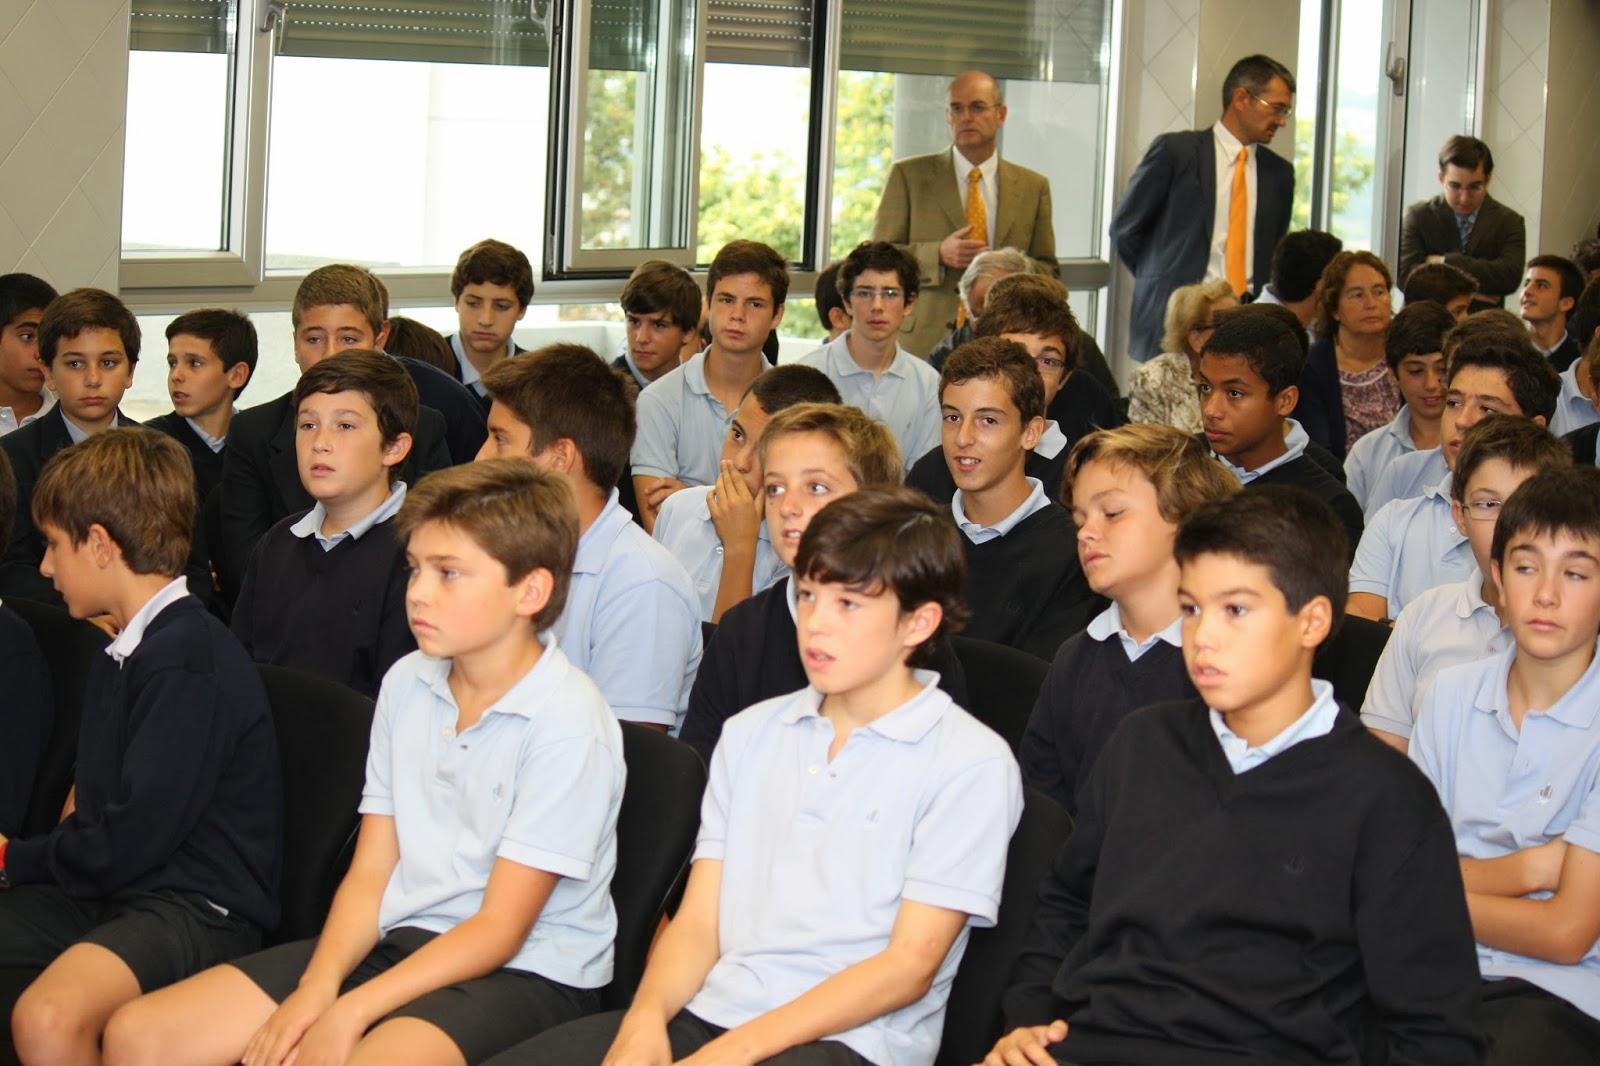 Virgen peregrina colegio montecastelo vigo - Colegio monterrey vigo ...